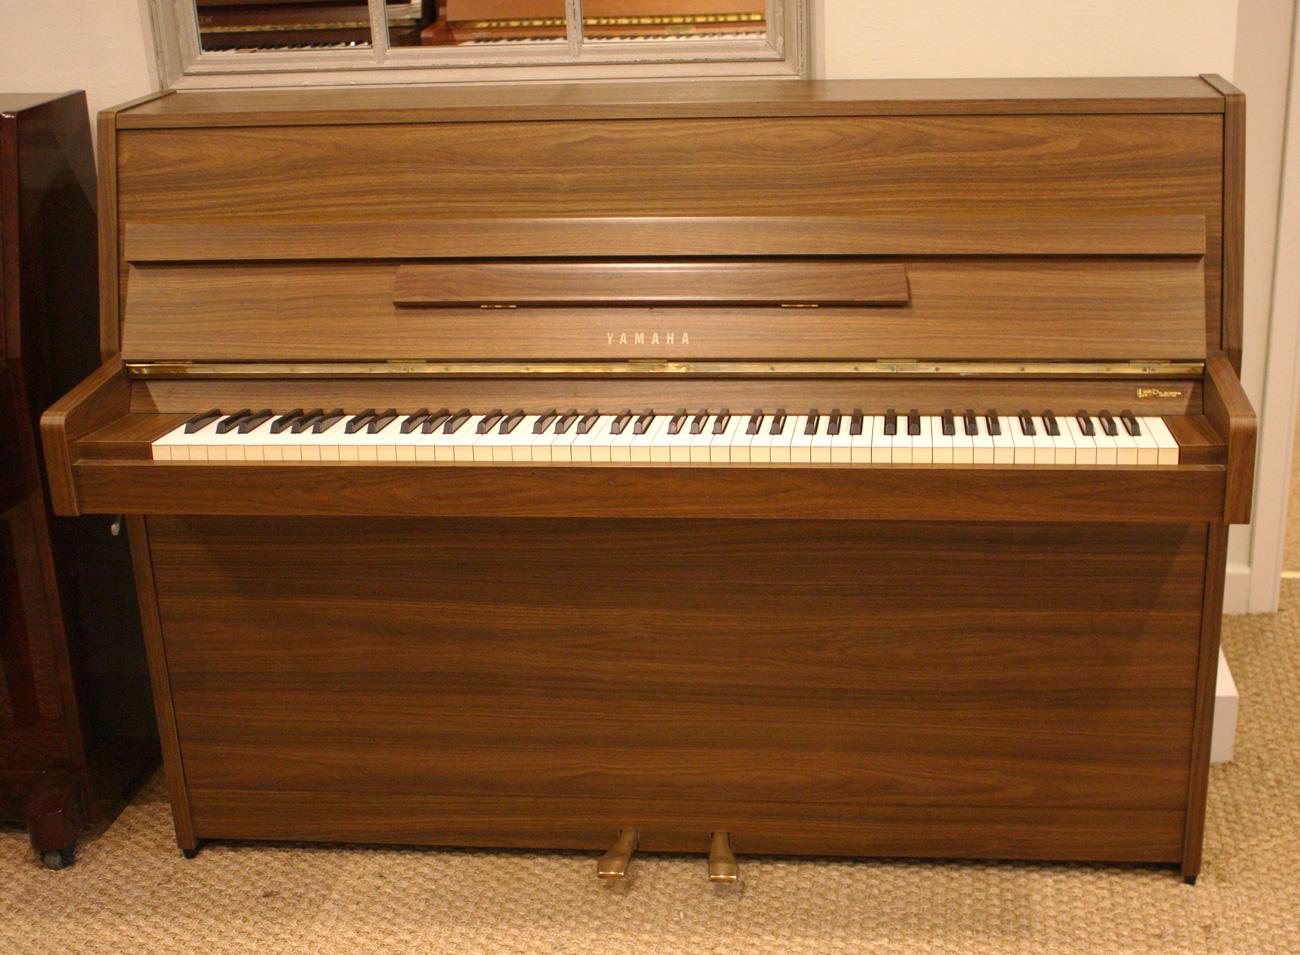 Yanaha LU101 Upright Piano